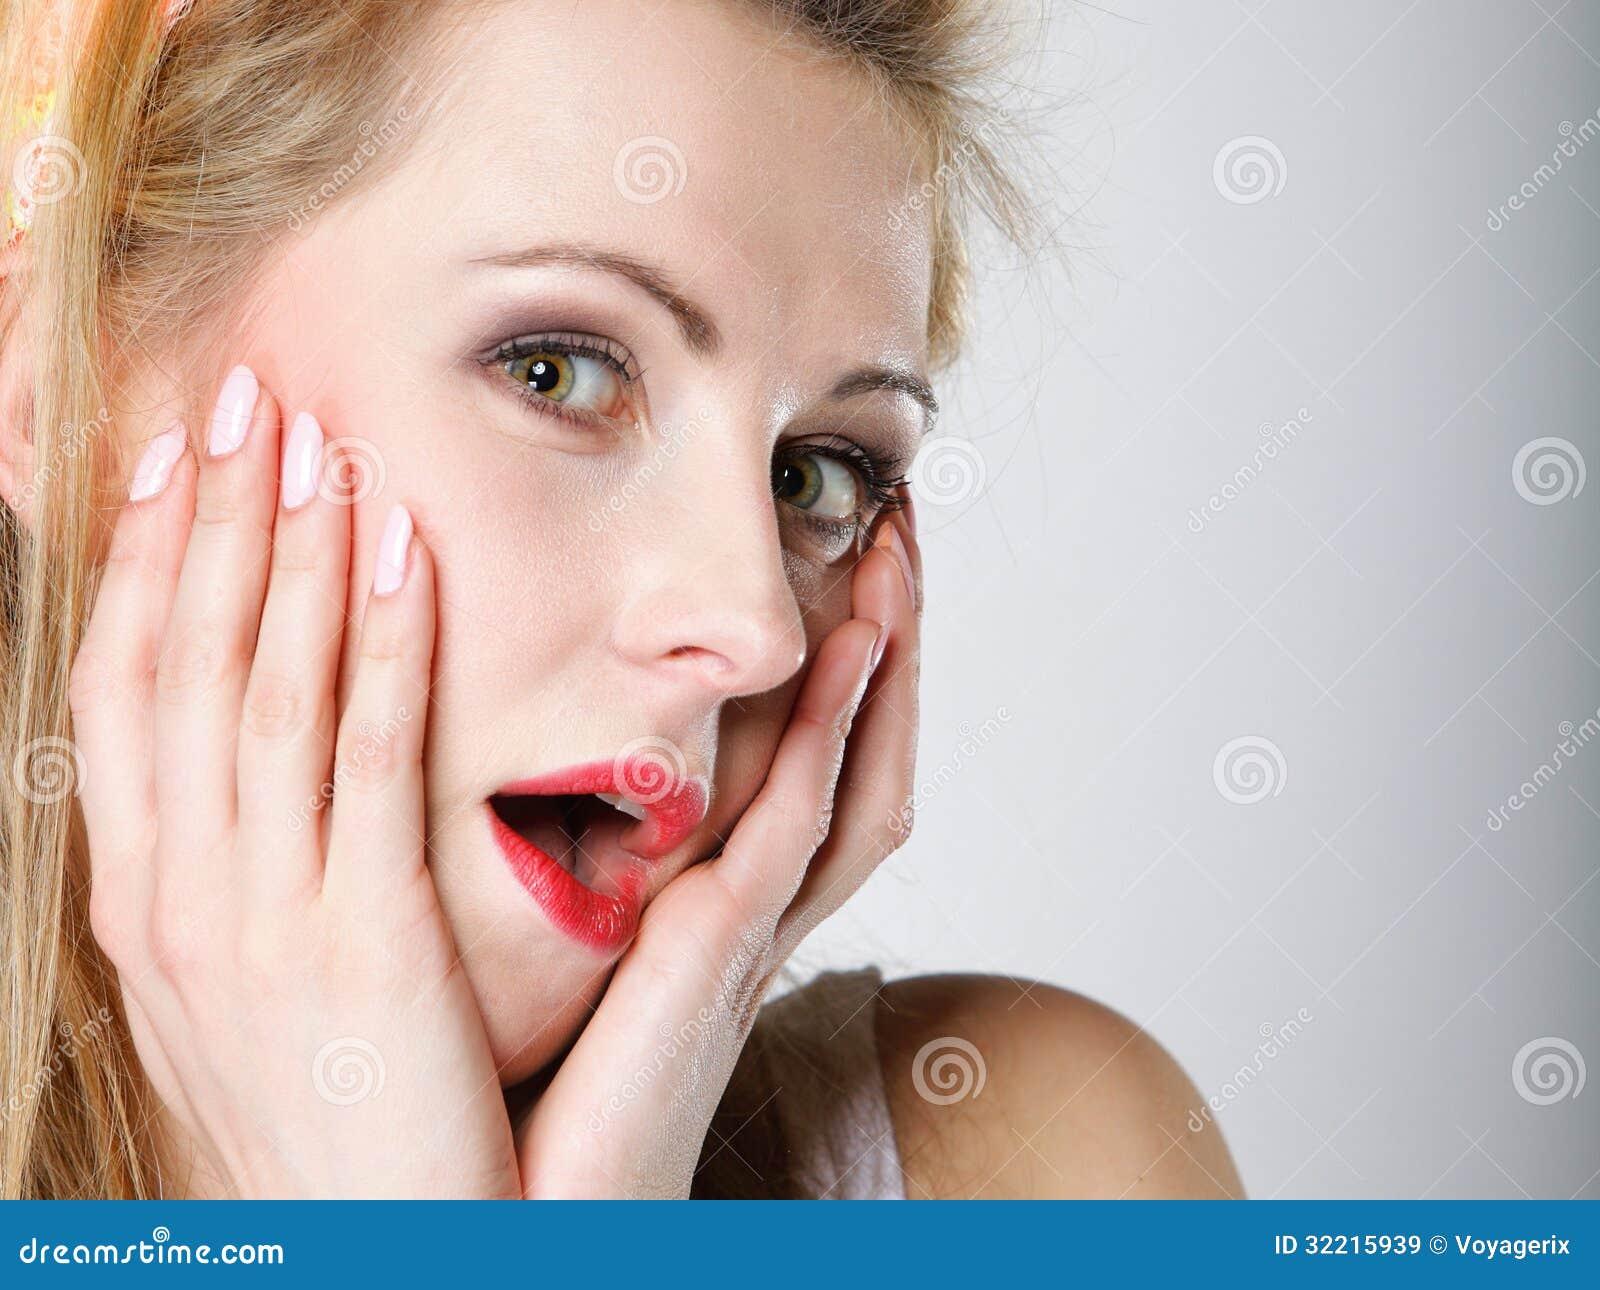 0117 open mouth facial wdw 1